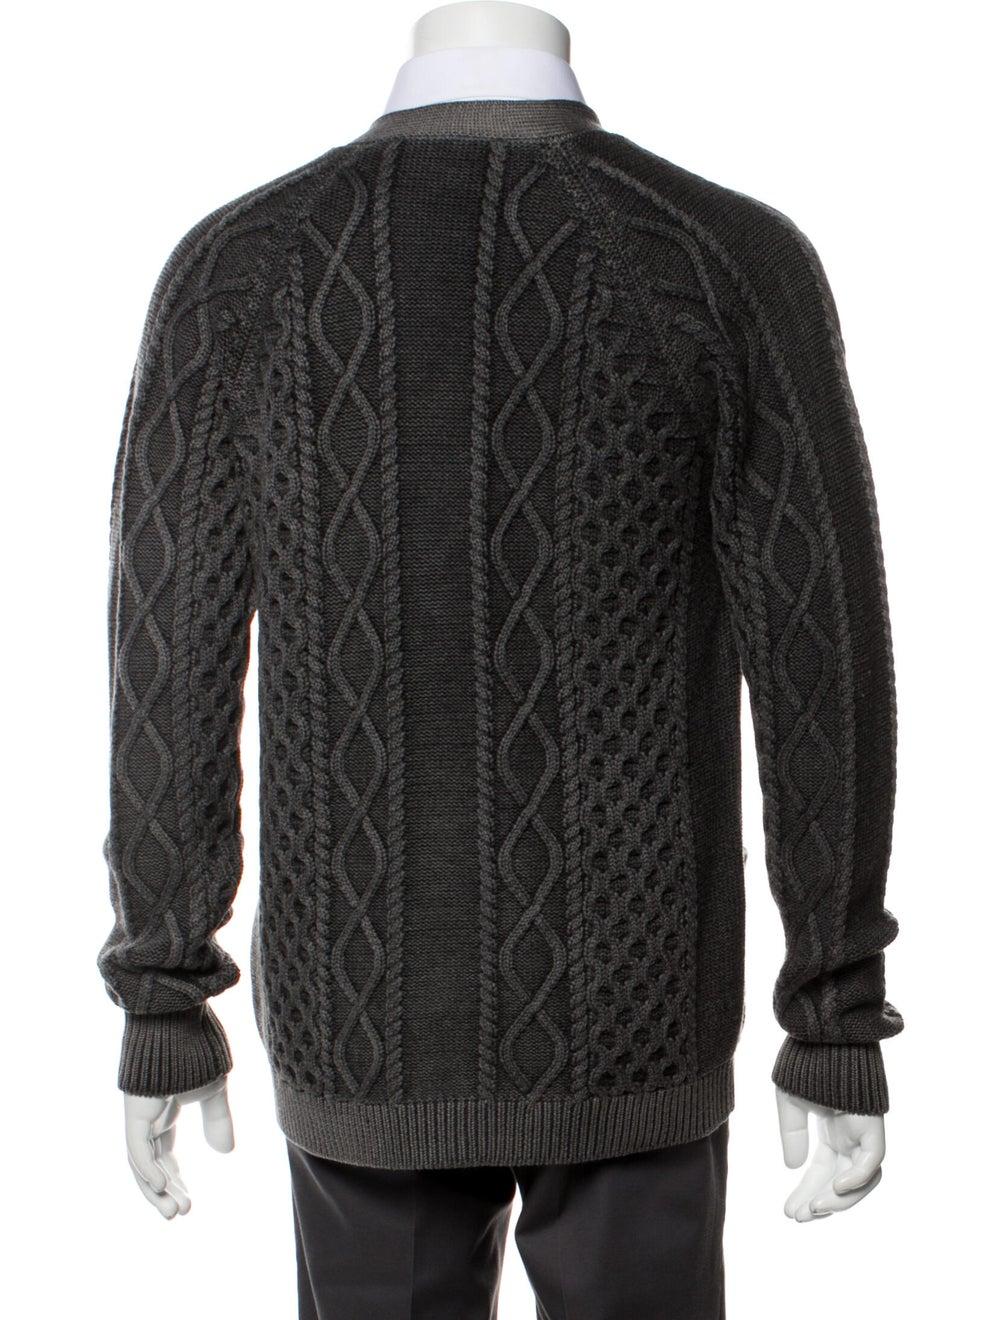 Prada Wool Printed Cardigan Wool - image 3